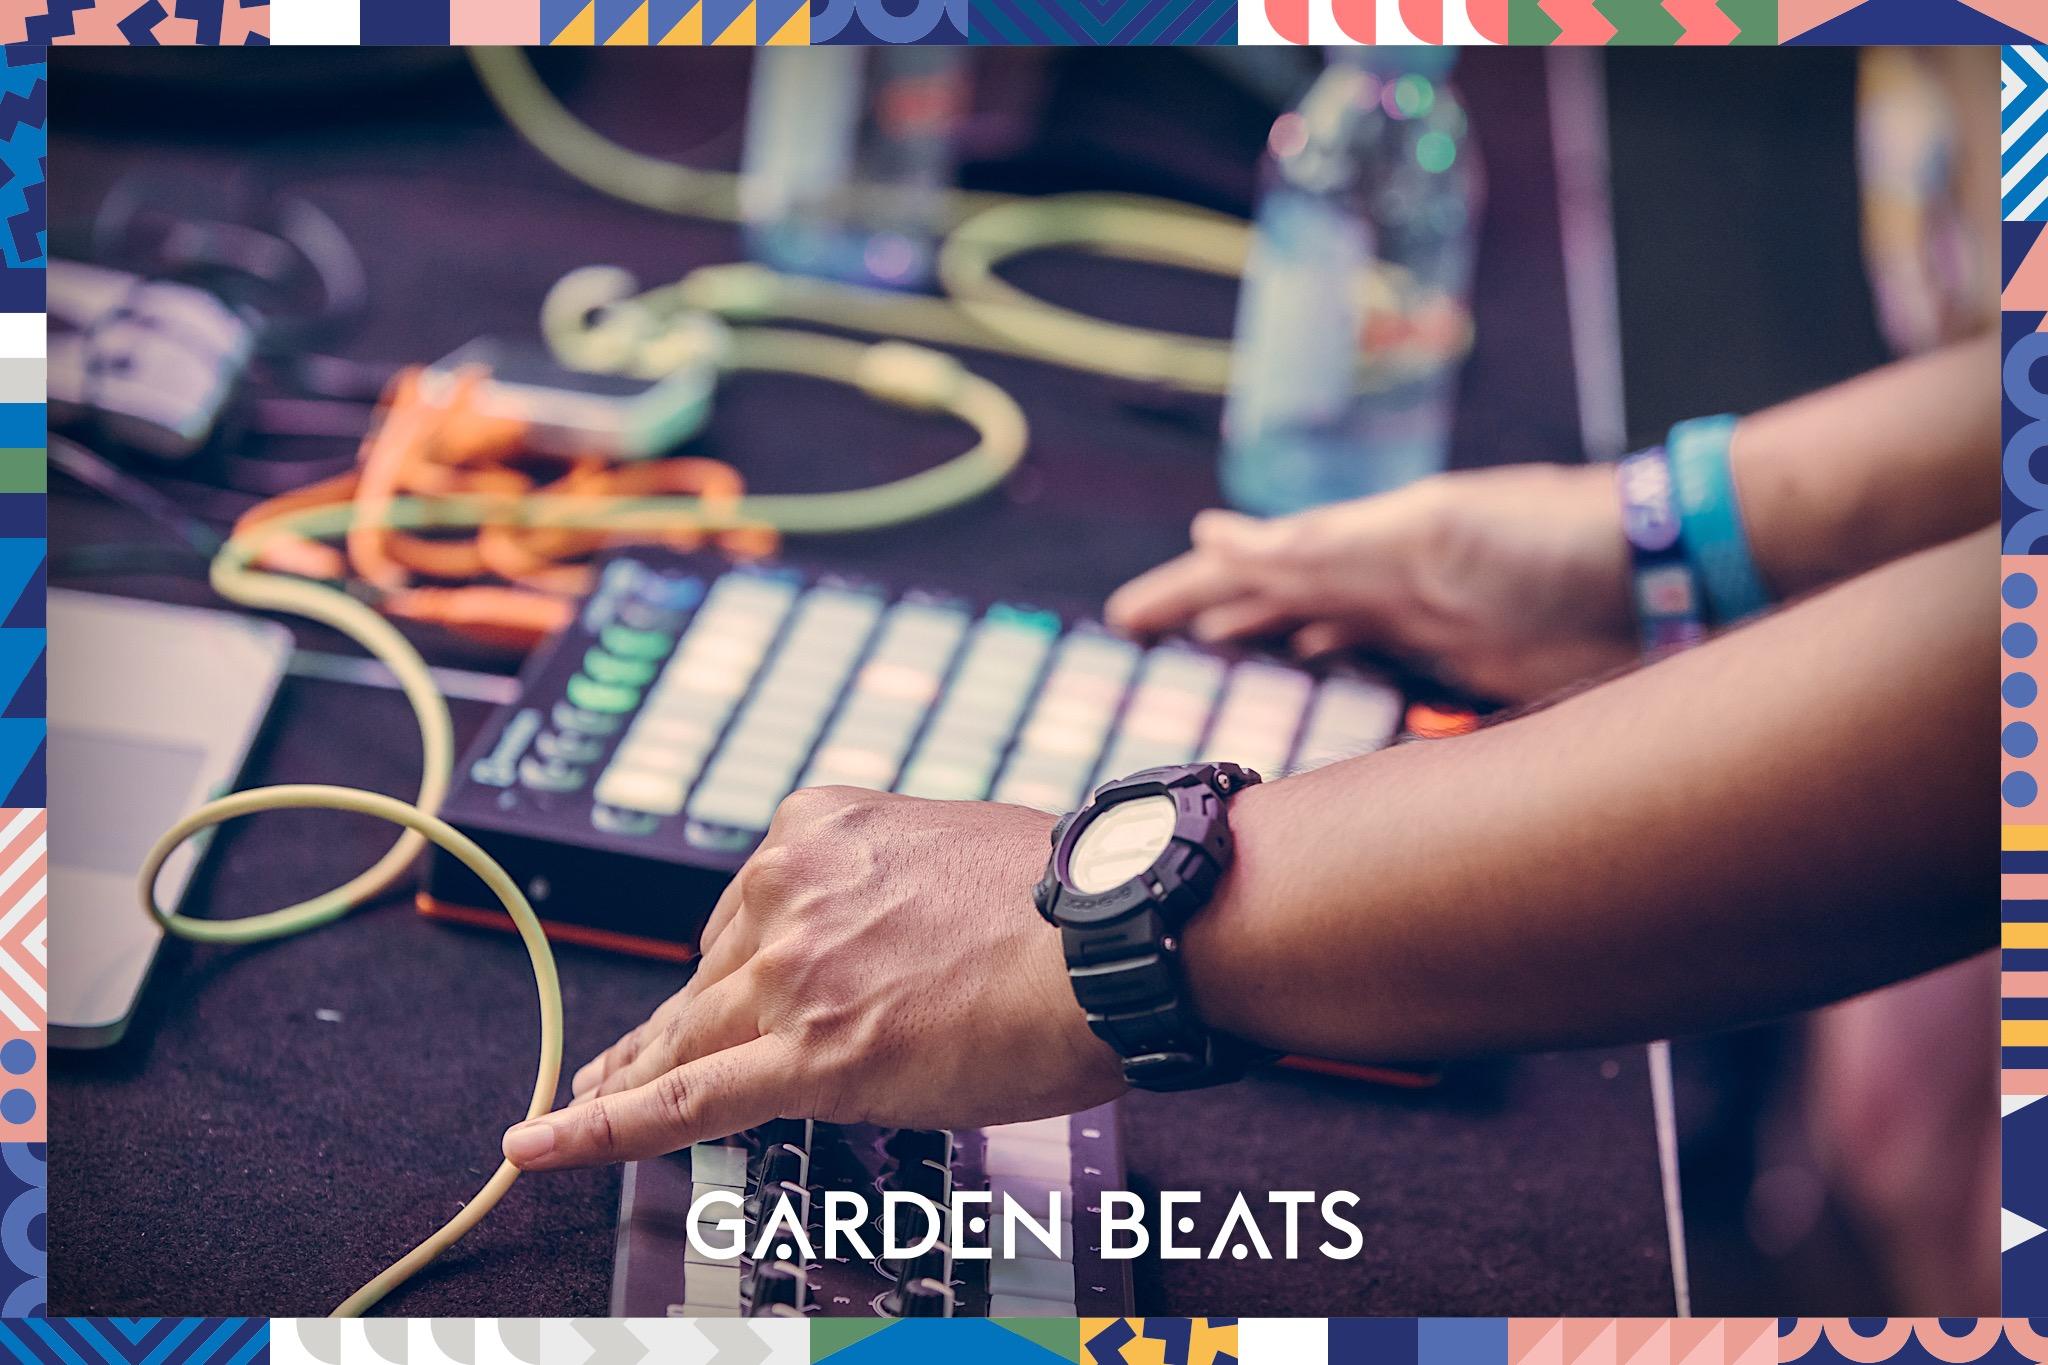 03032018_GardenBeats_Colossal457_Watermarked.jpg